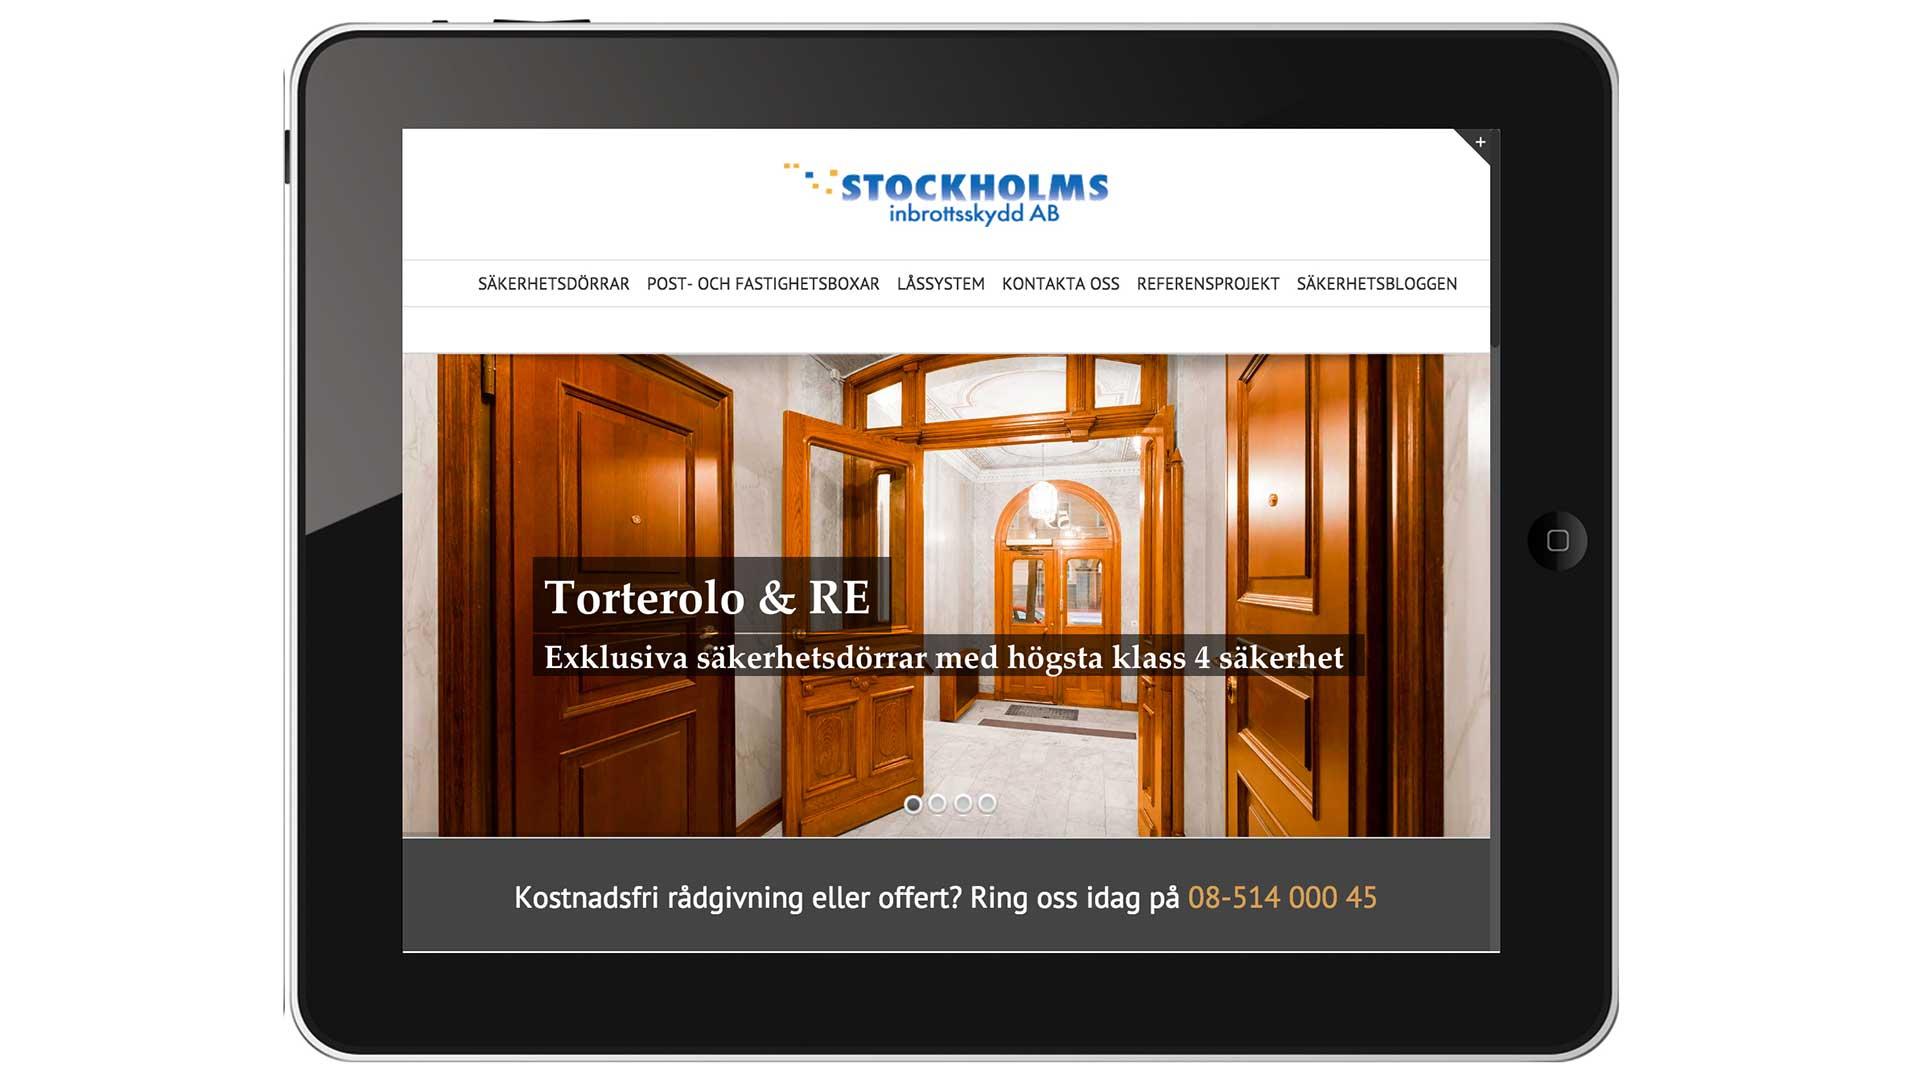 Stockholmsinbrottsskydd.se på tablet